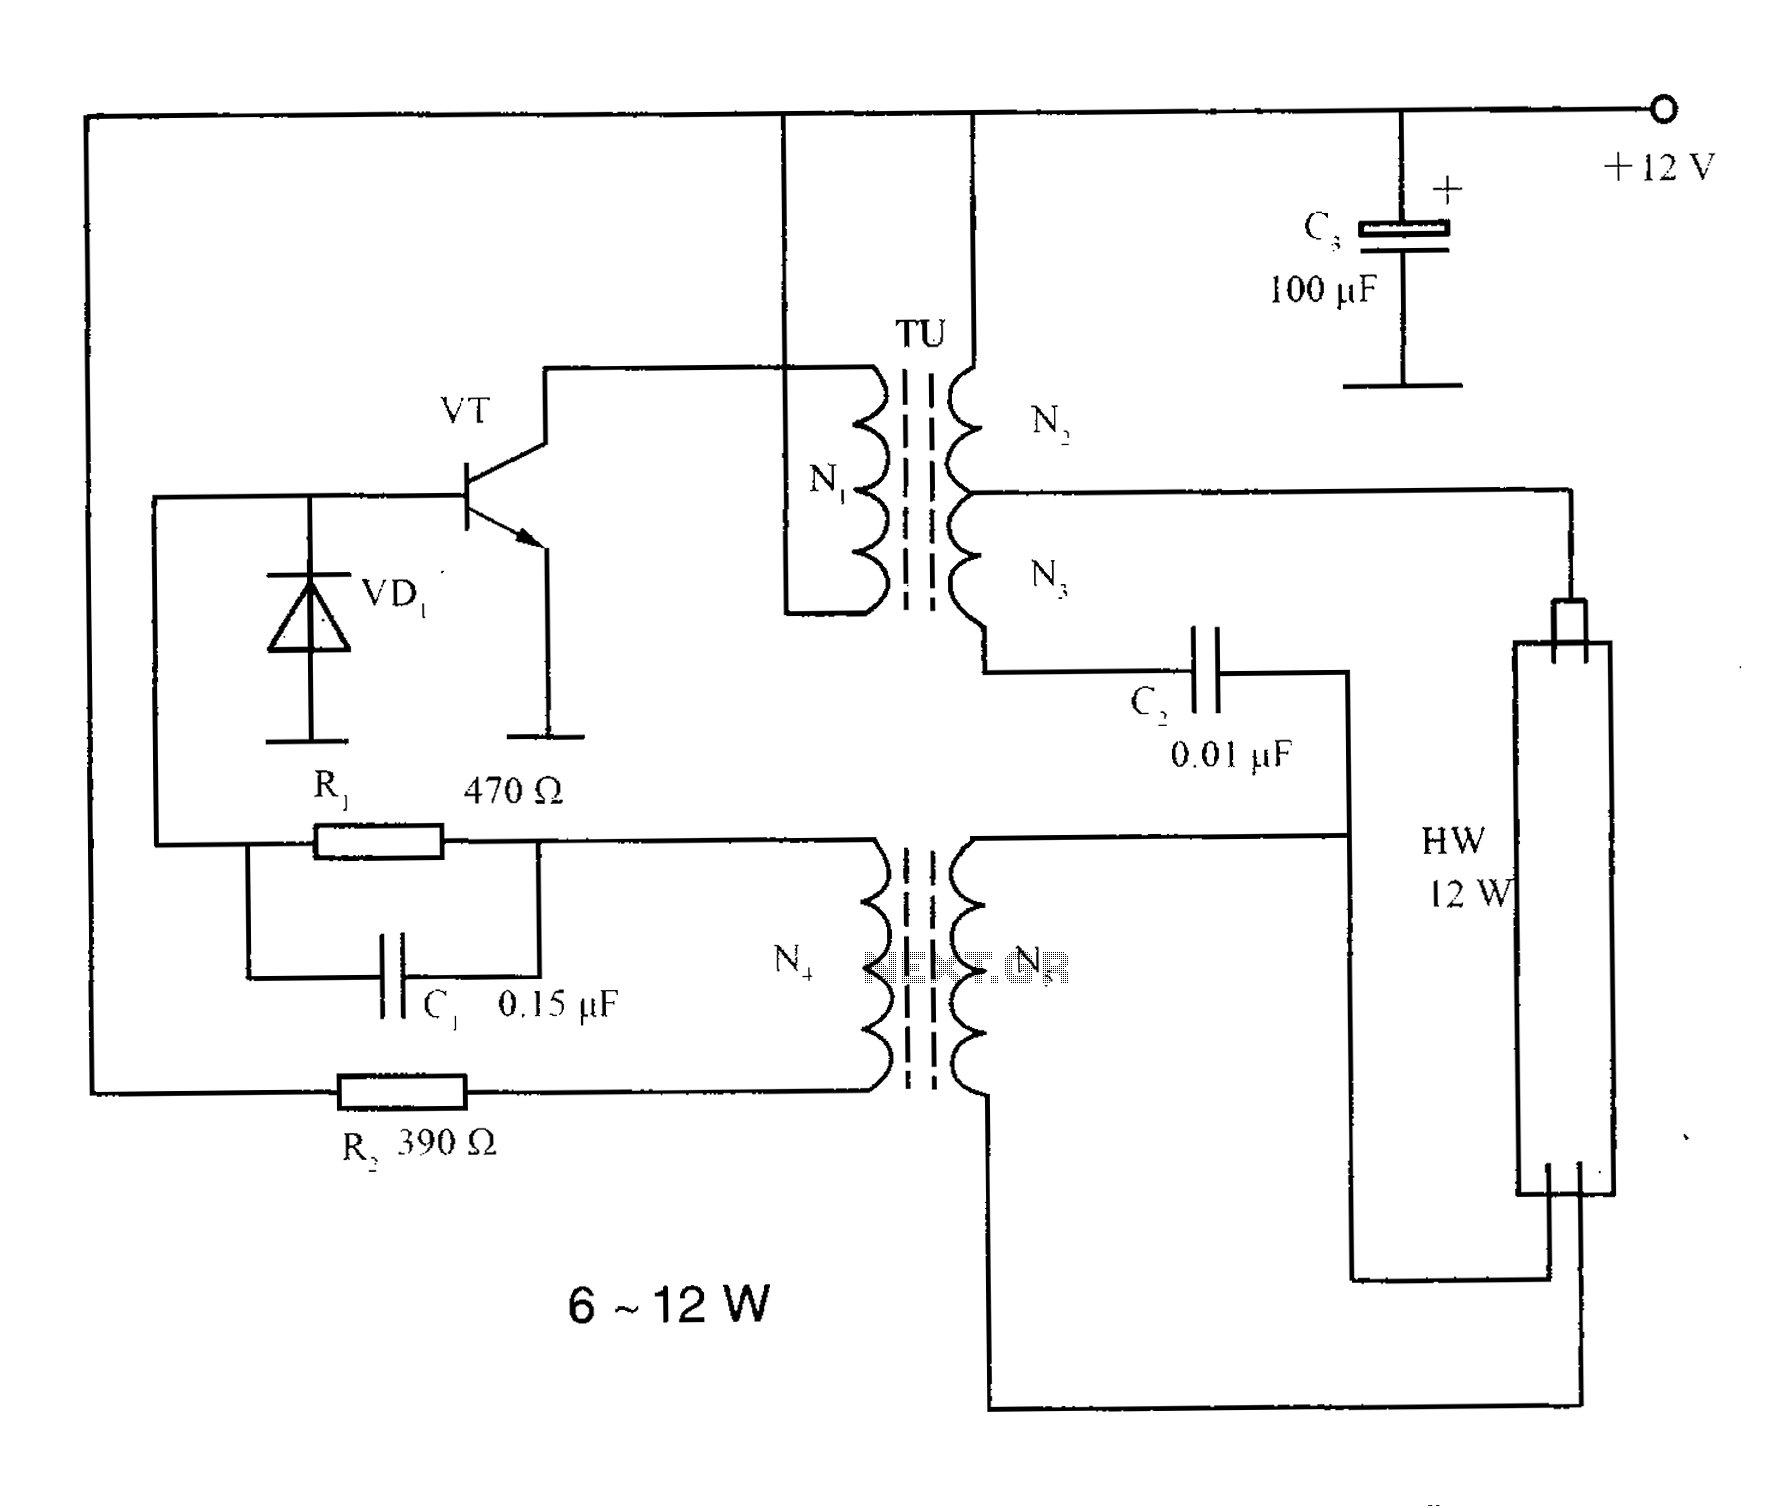 Touch Lamp Sensor Wiring Diagram | Wiring Library - Touch Lamp Sensor Wiring Diagram